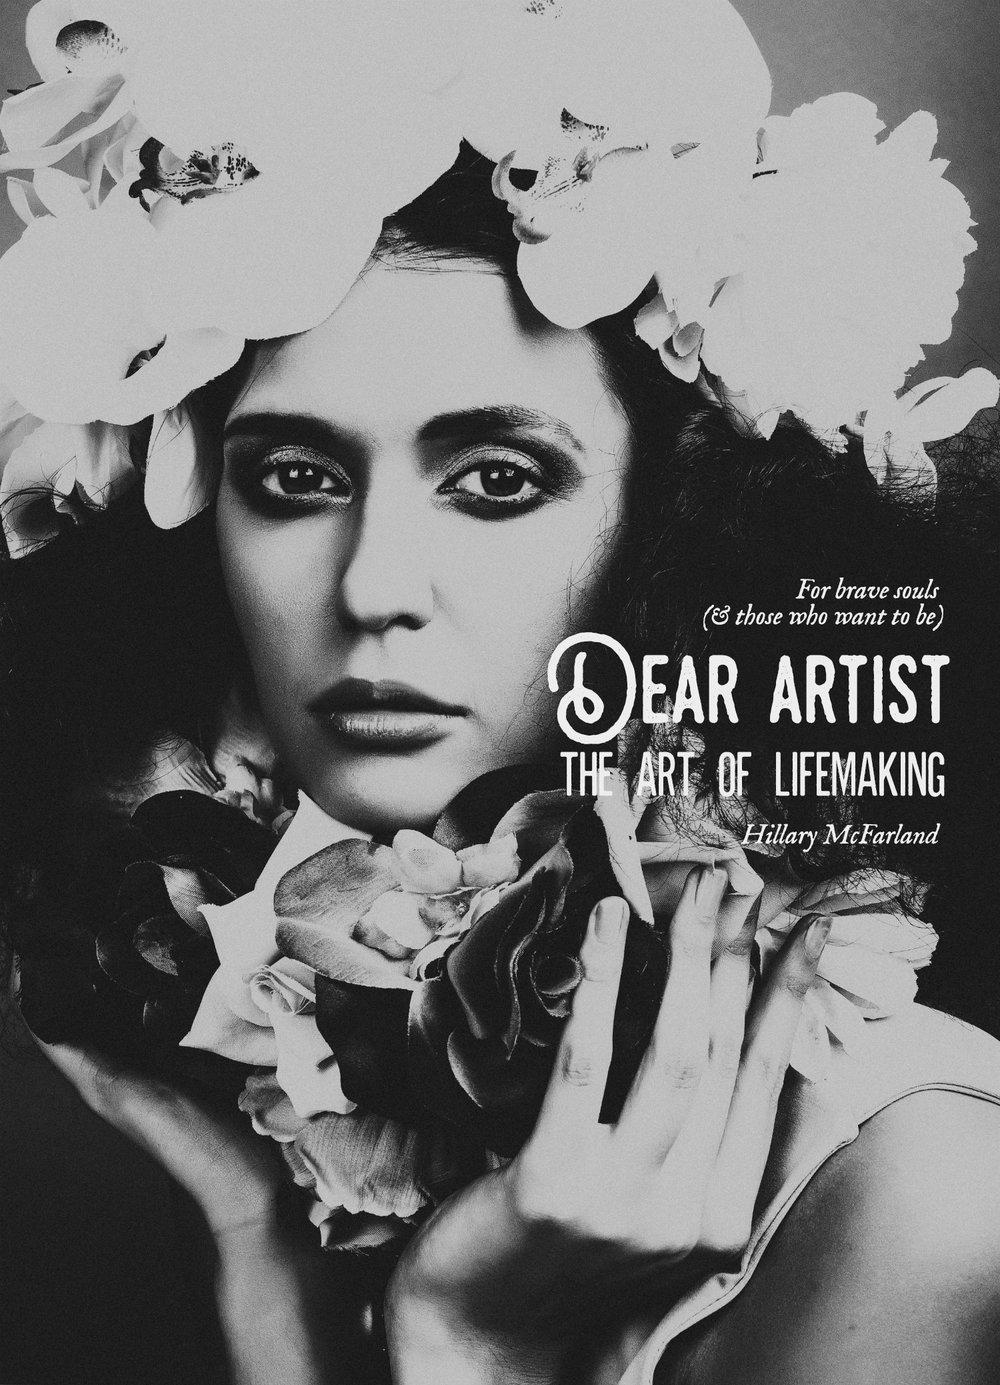 Dear Artist cover 2018.jpg